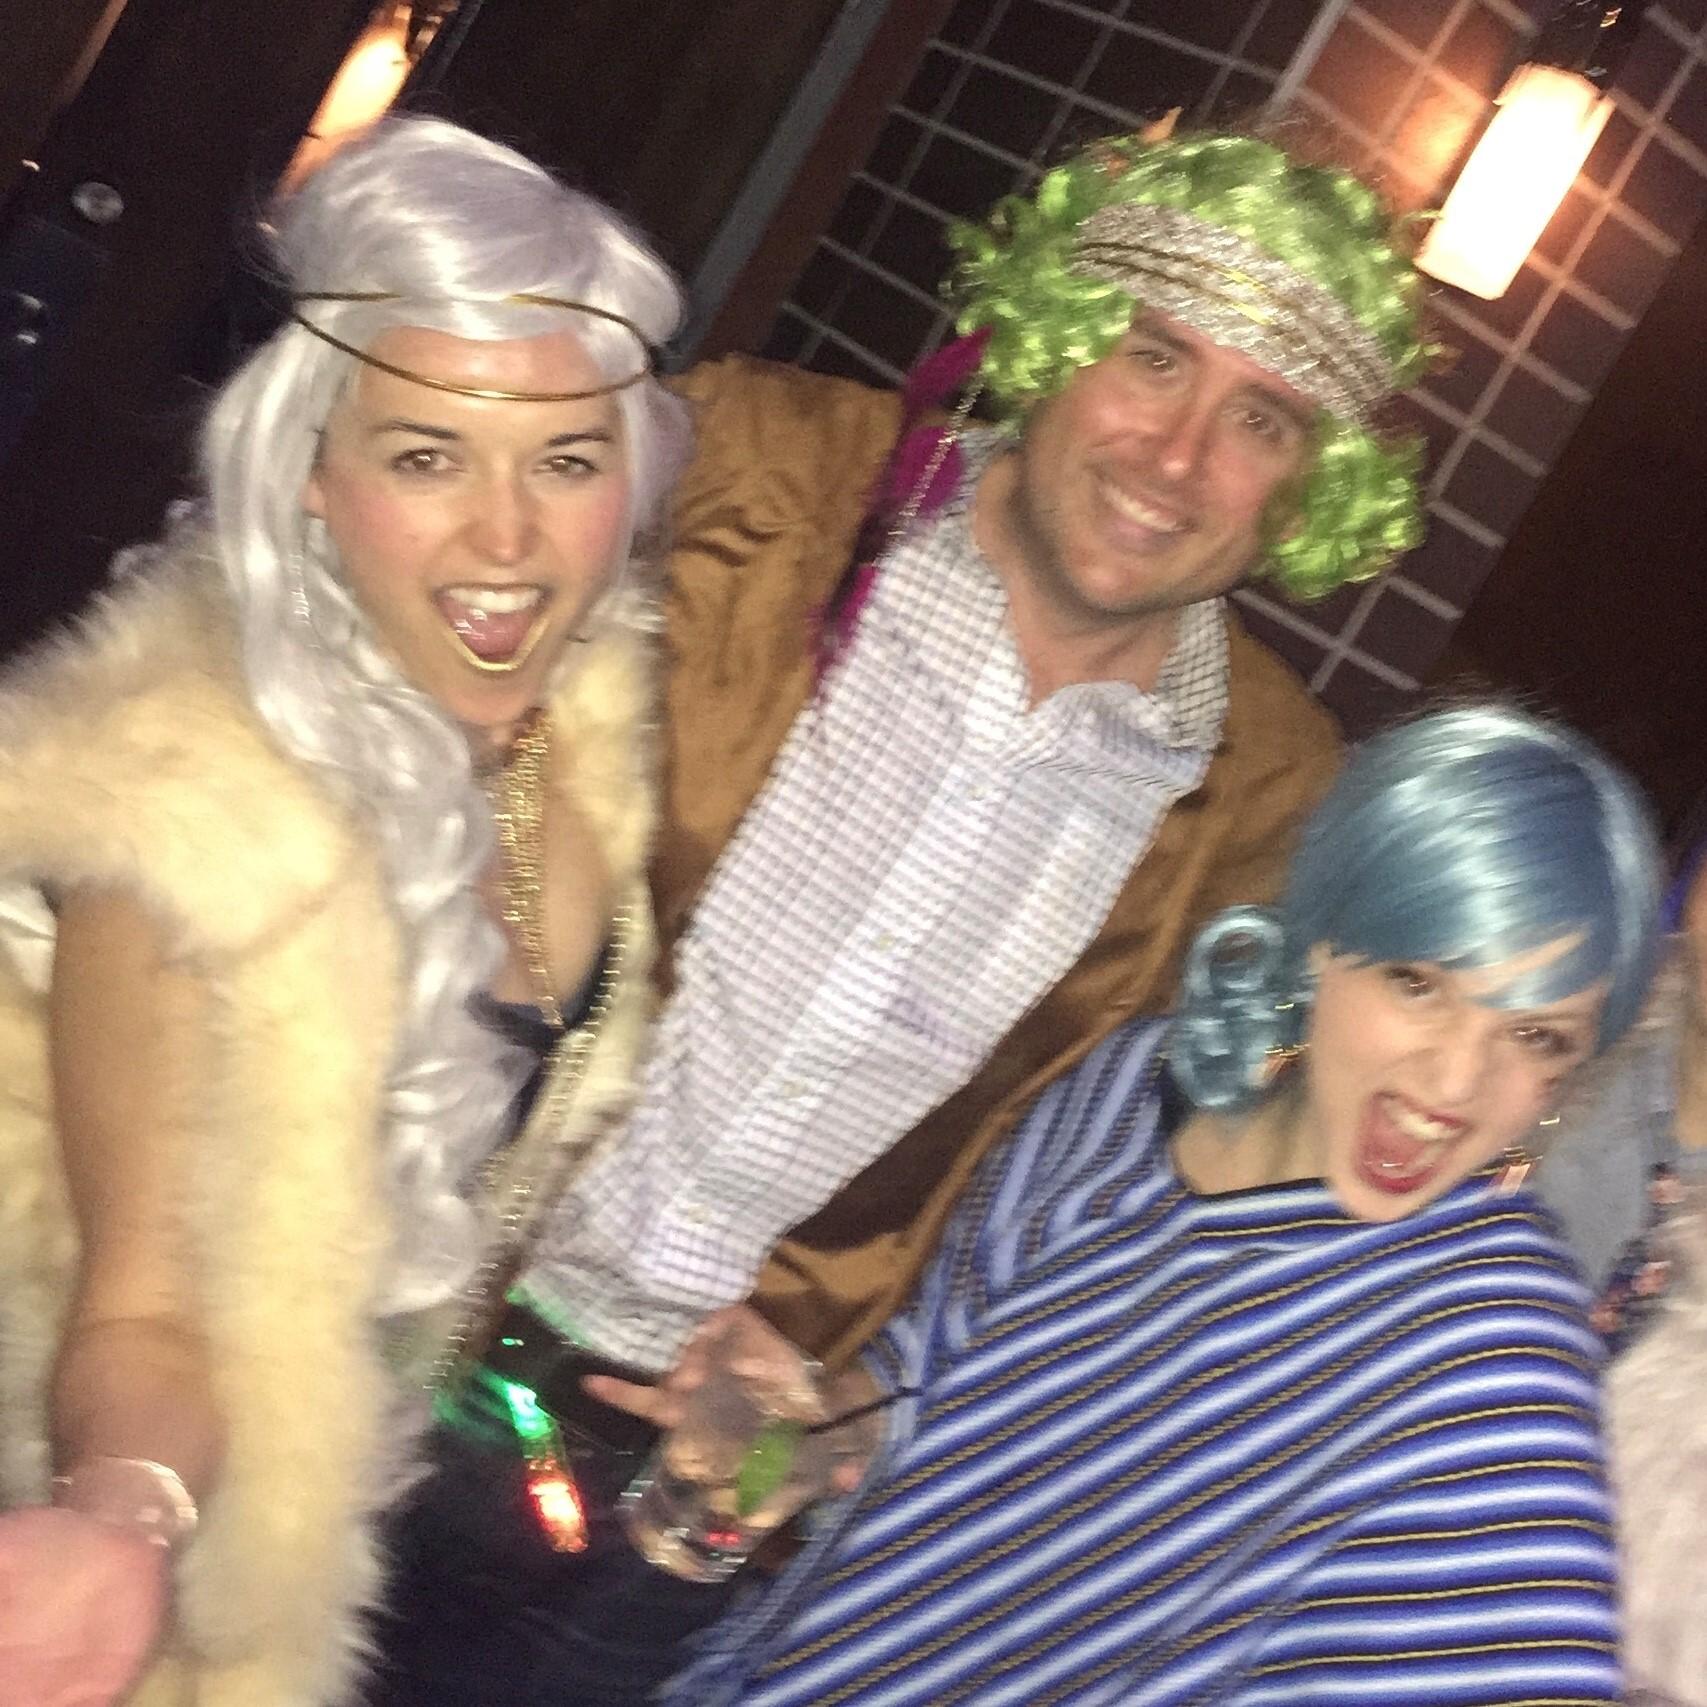 Bachelorette Party with Damaris, circa 2016.